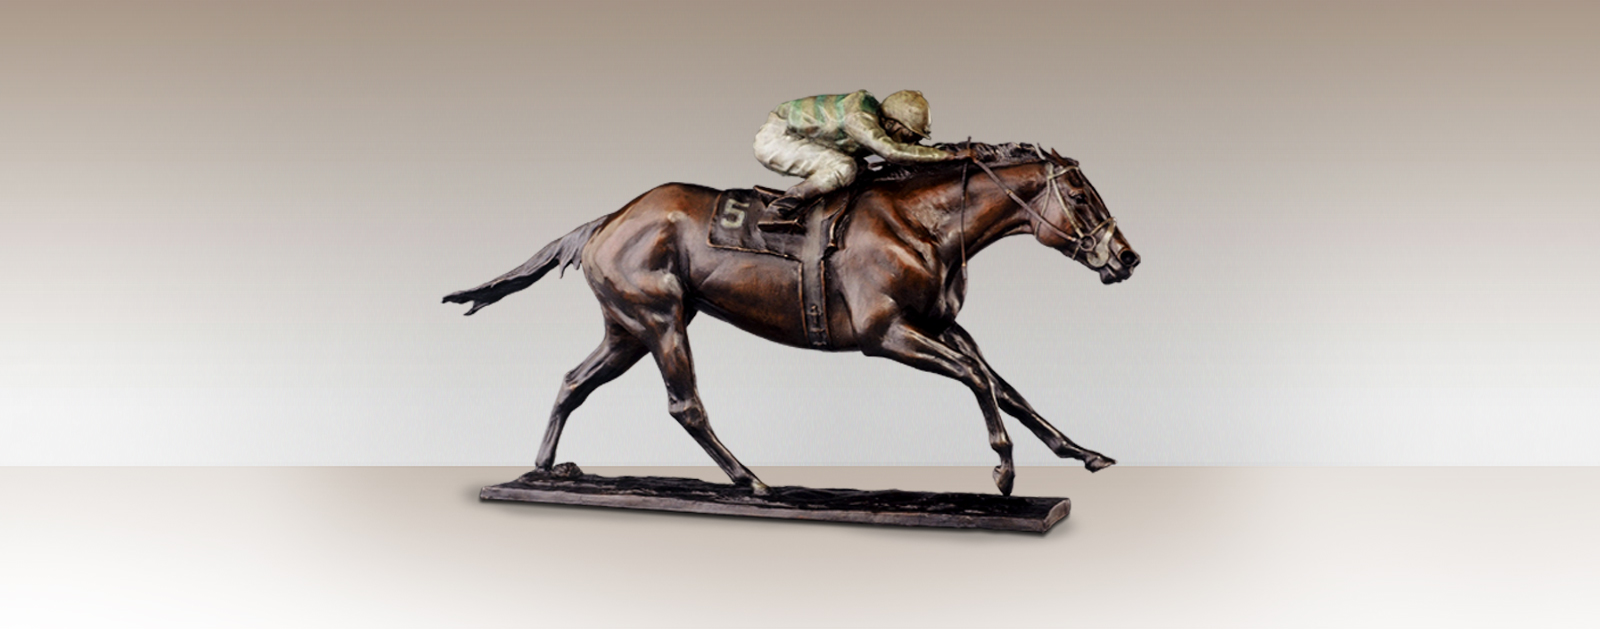 bronze-horse-statue-equine-sculpture-serenas-song